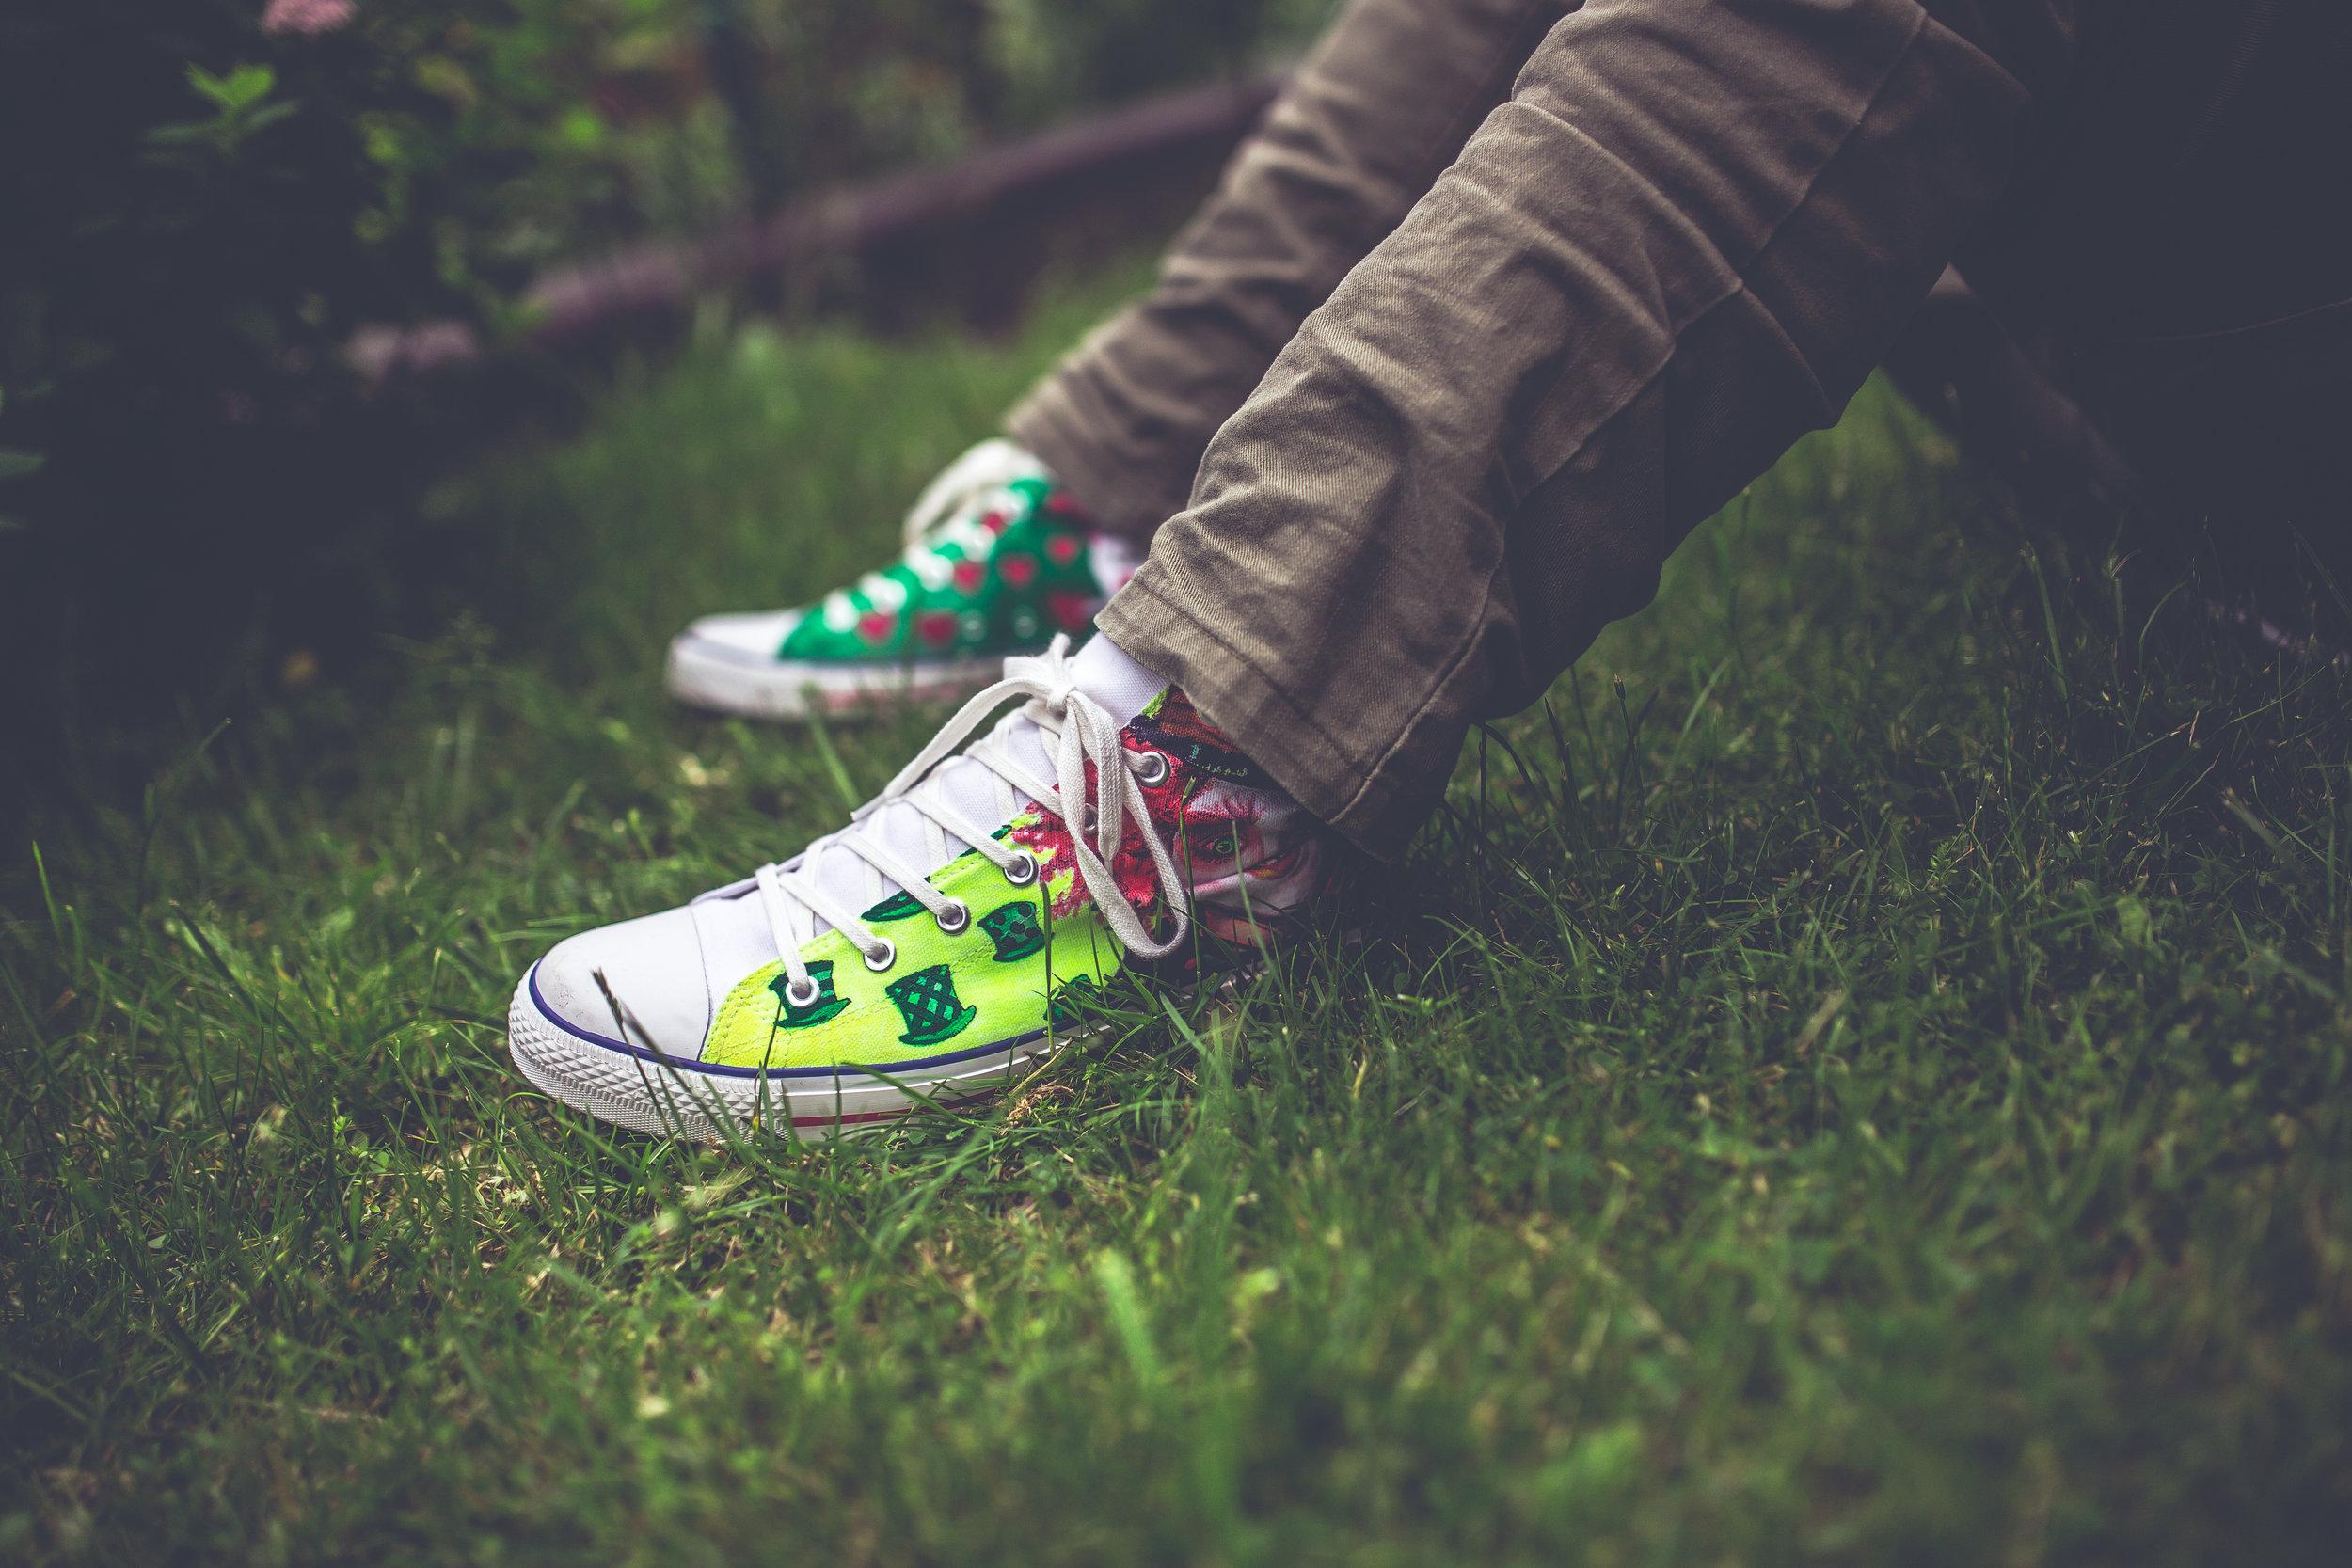 garden-sitting-grass-shoes.jpg